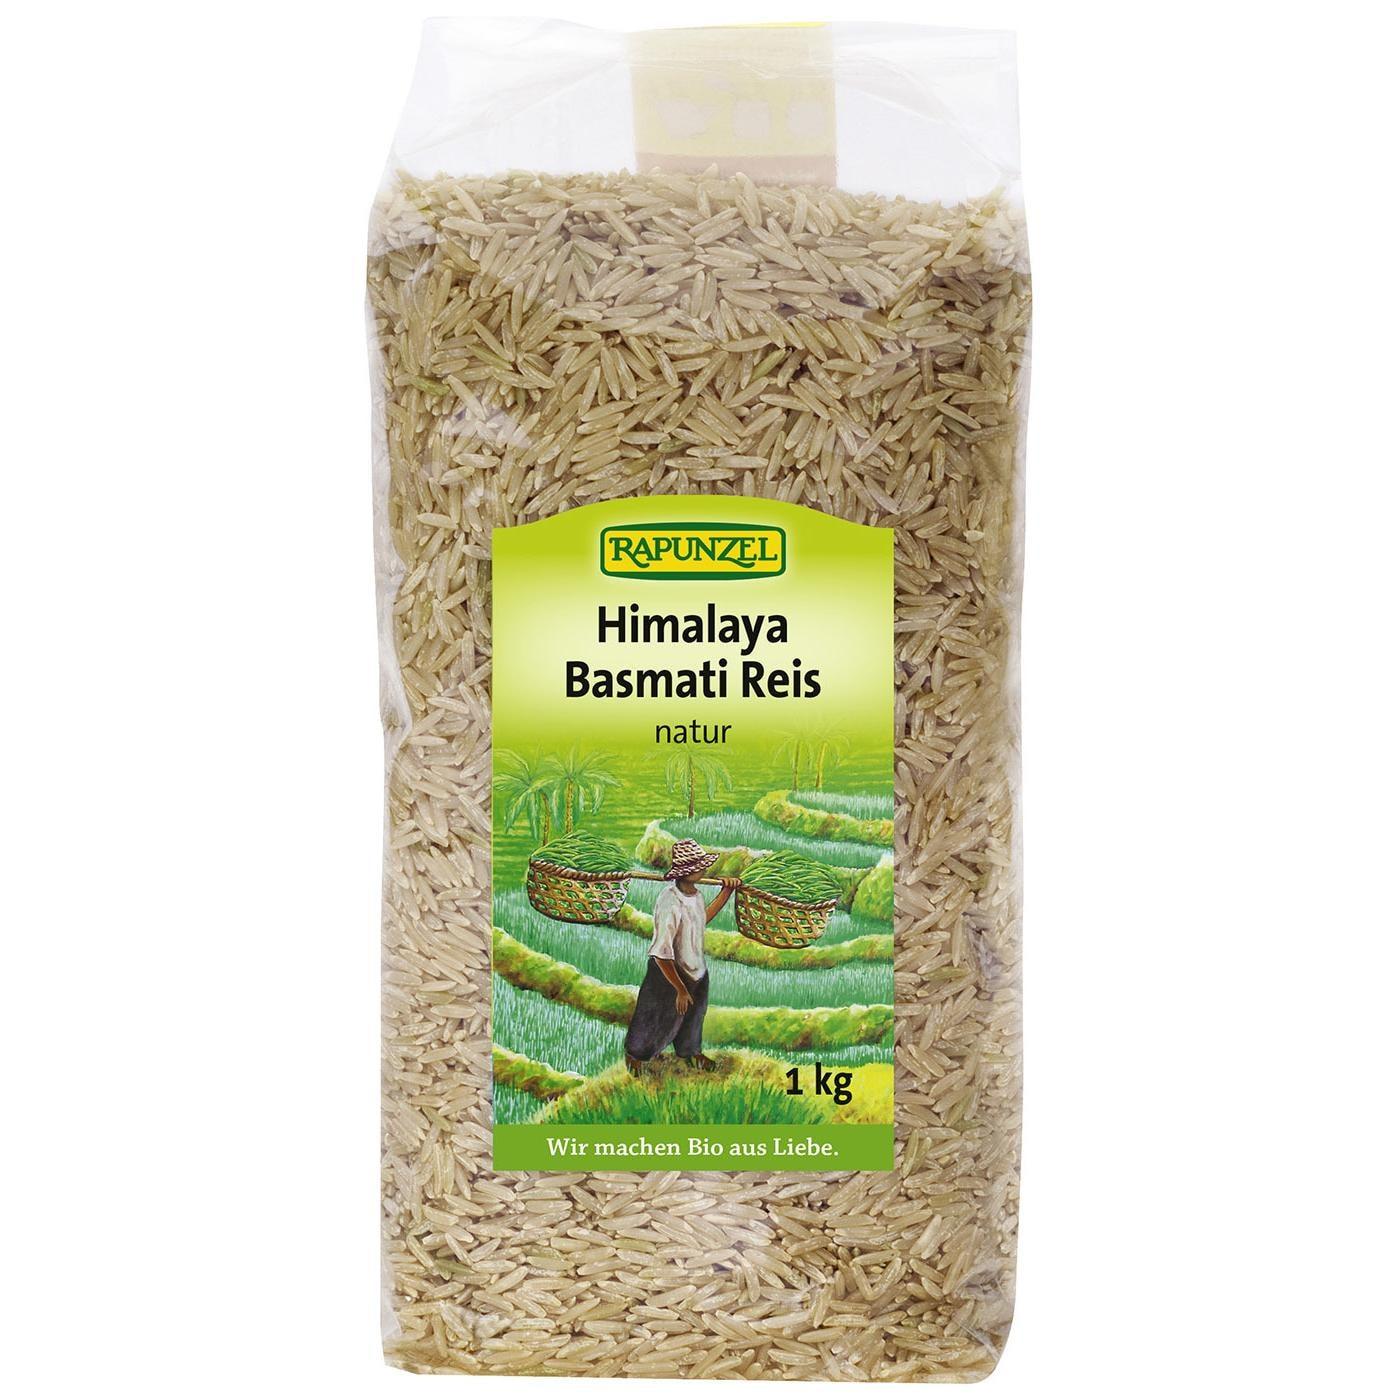 Rapunzel Bio Himalaya Basmati Reis natur 1kg